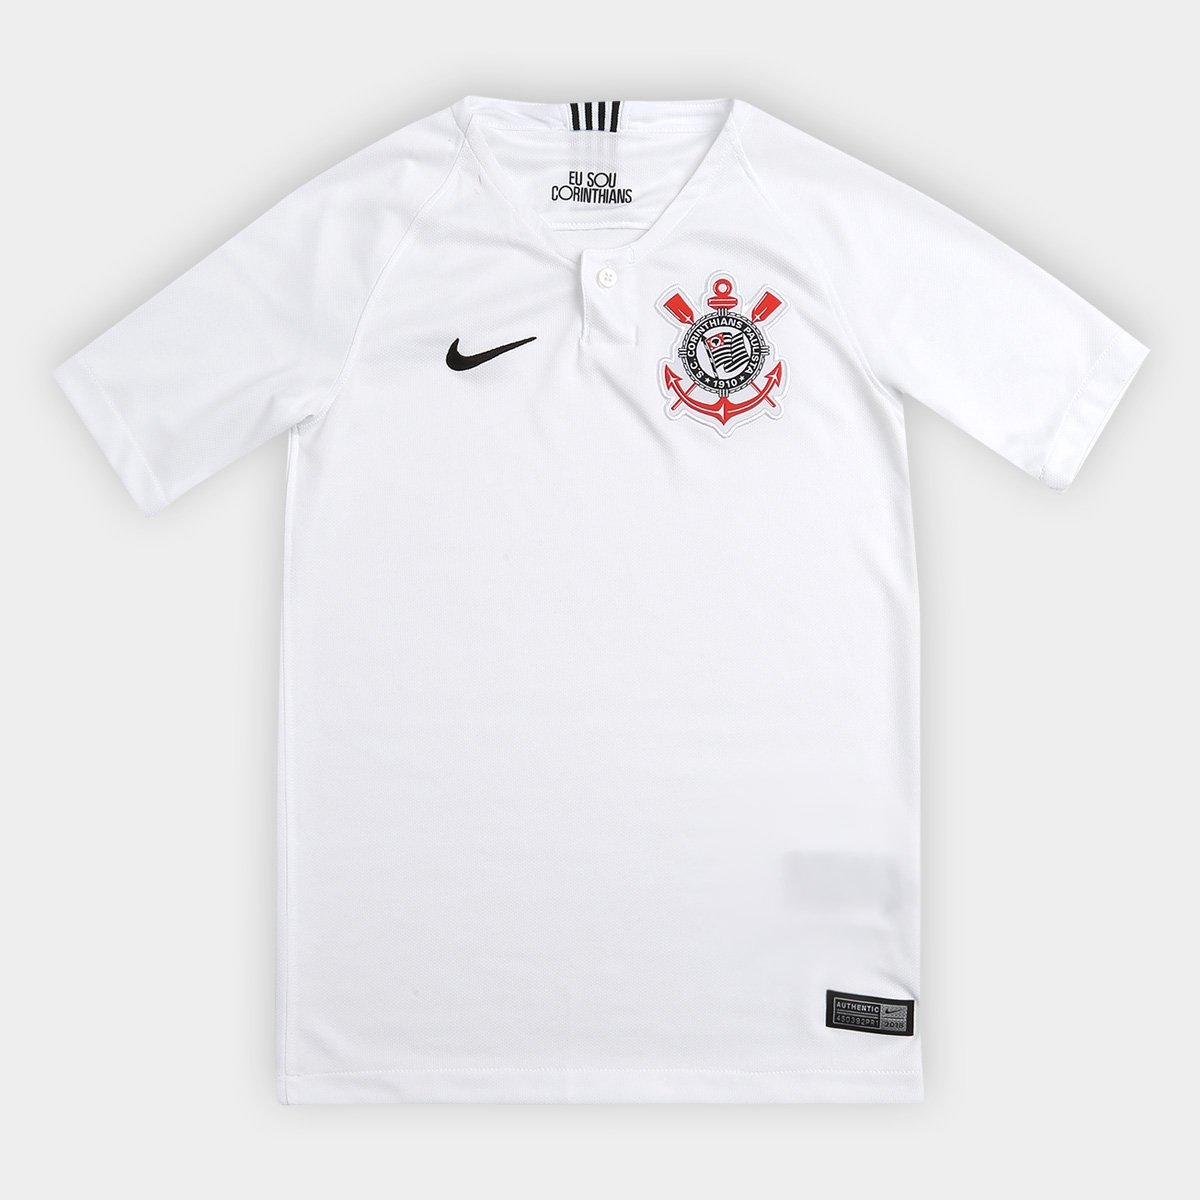 75a35d3588cf9 Camisa Corinthians Juvenil I 18 19 s n° - Torcedor Nike - Compre Agora